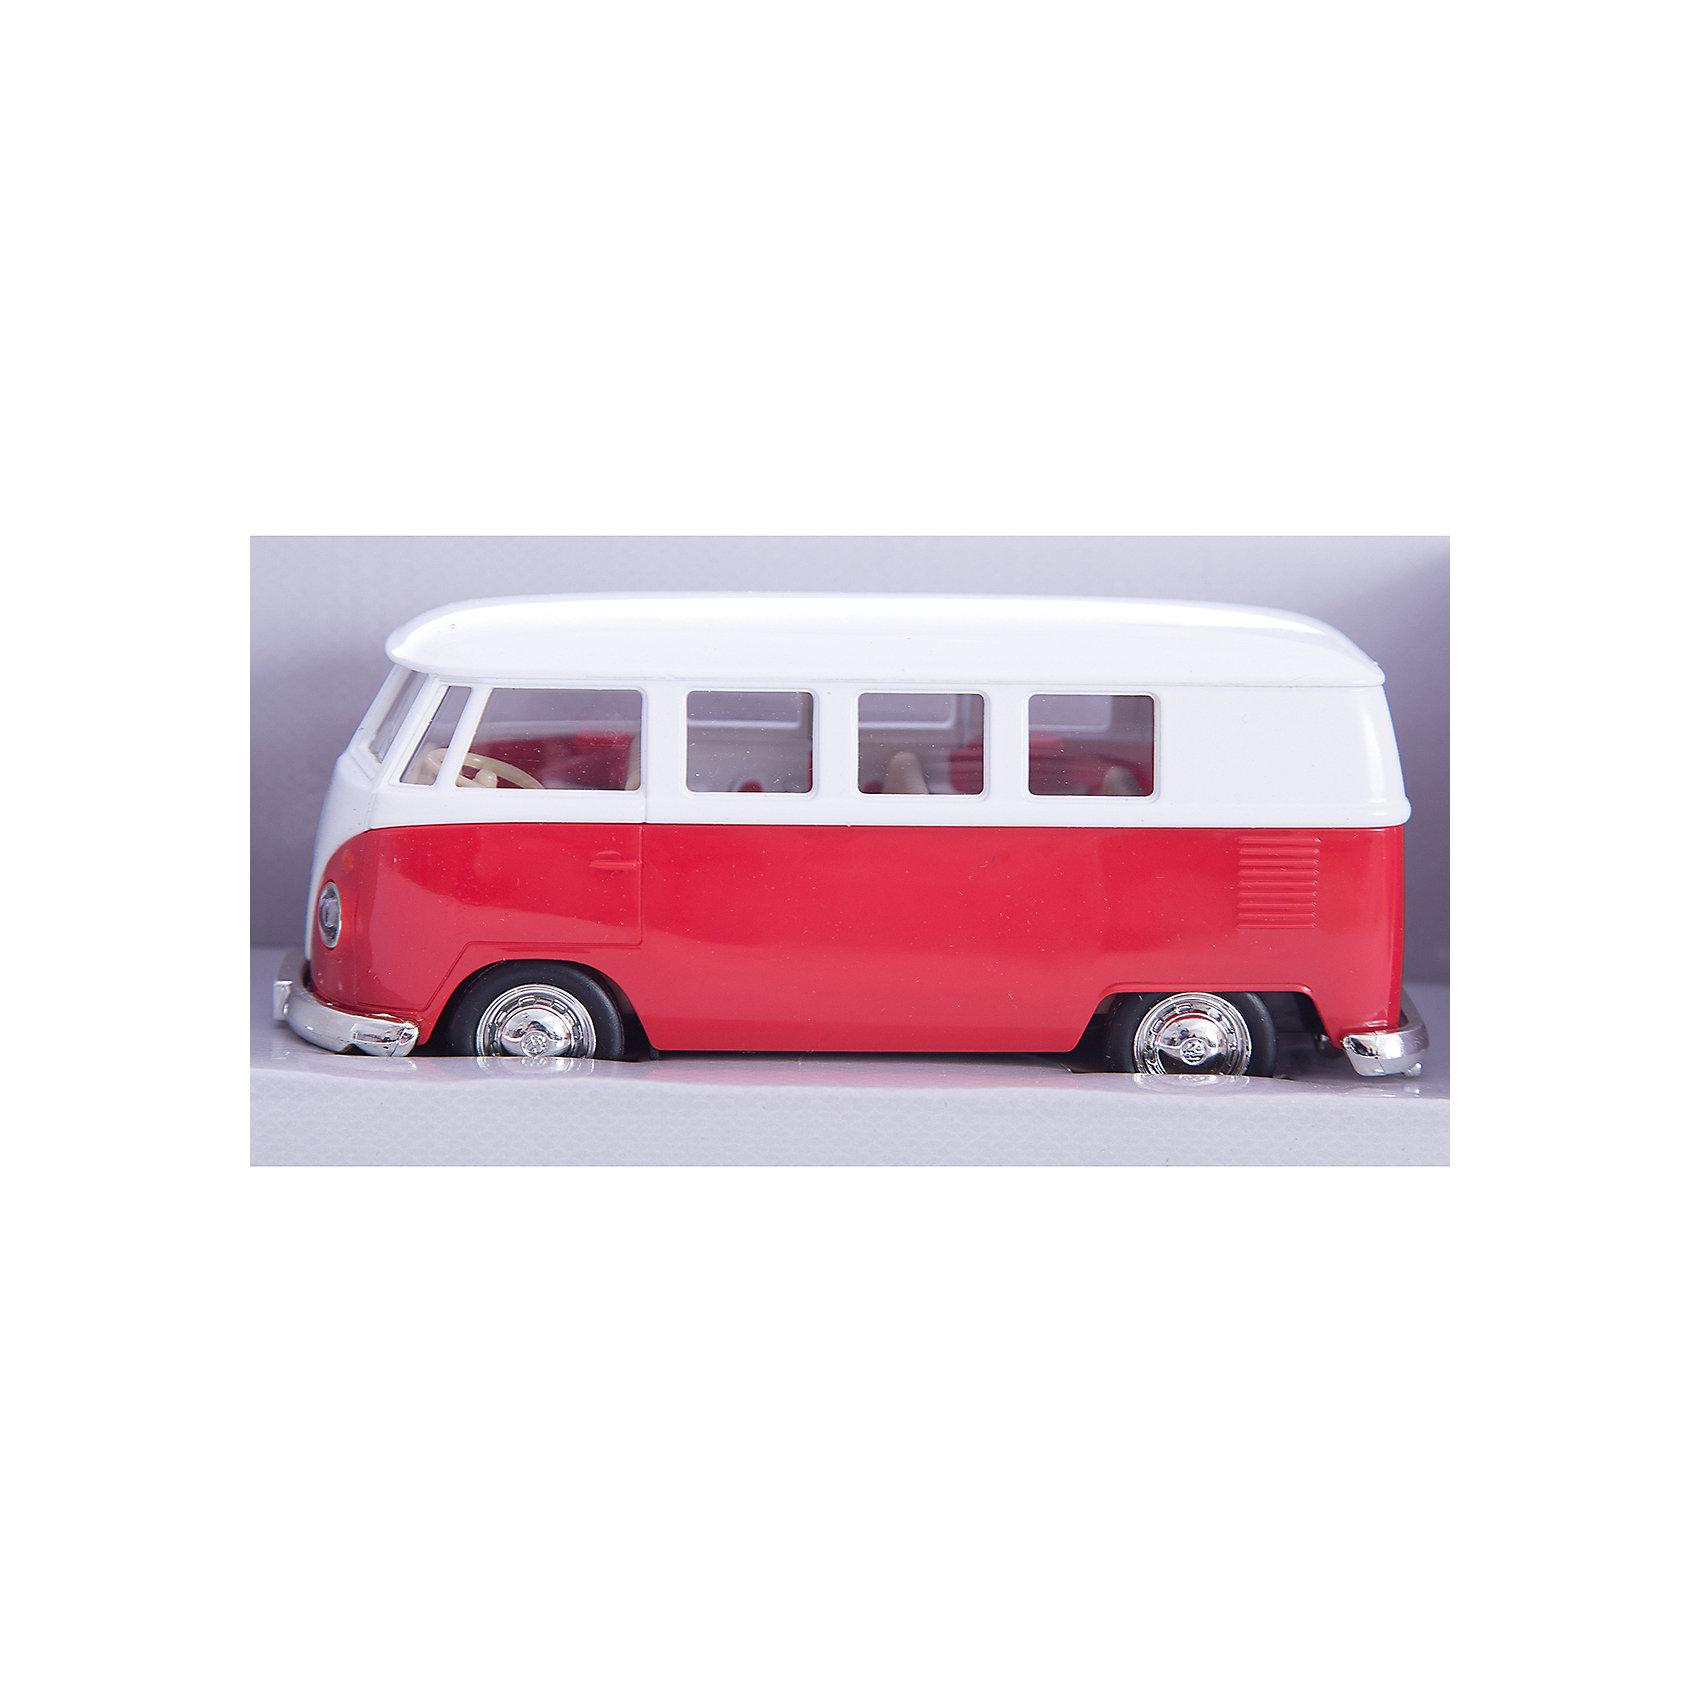 Машинка Volkswagen T1 Transporter 5, AutotimeМашинки<br><br><br>Ширина мм: 165<br>Глубина мм: 57<br>Высота мм: 75<br>Вес г: 13<br>Возраст от месяцев: 36<br>Возраст до месяцев: 2147483647<br>Пол: Мужской<br>Возраст: Детский<br>SKU: 5584111